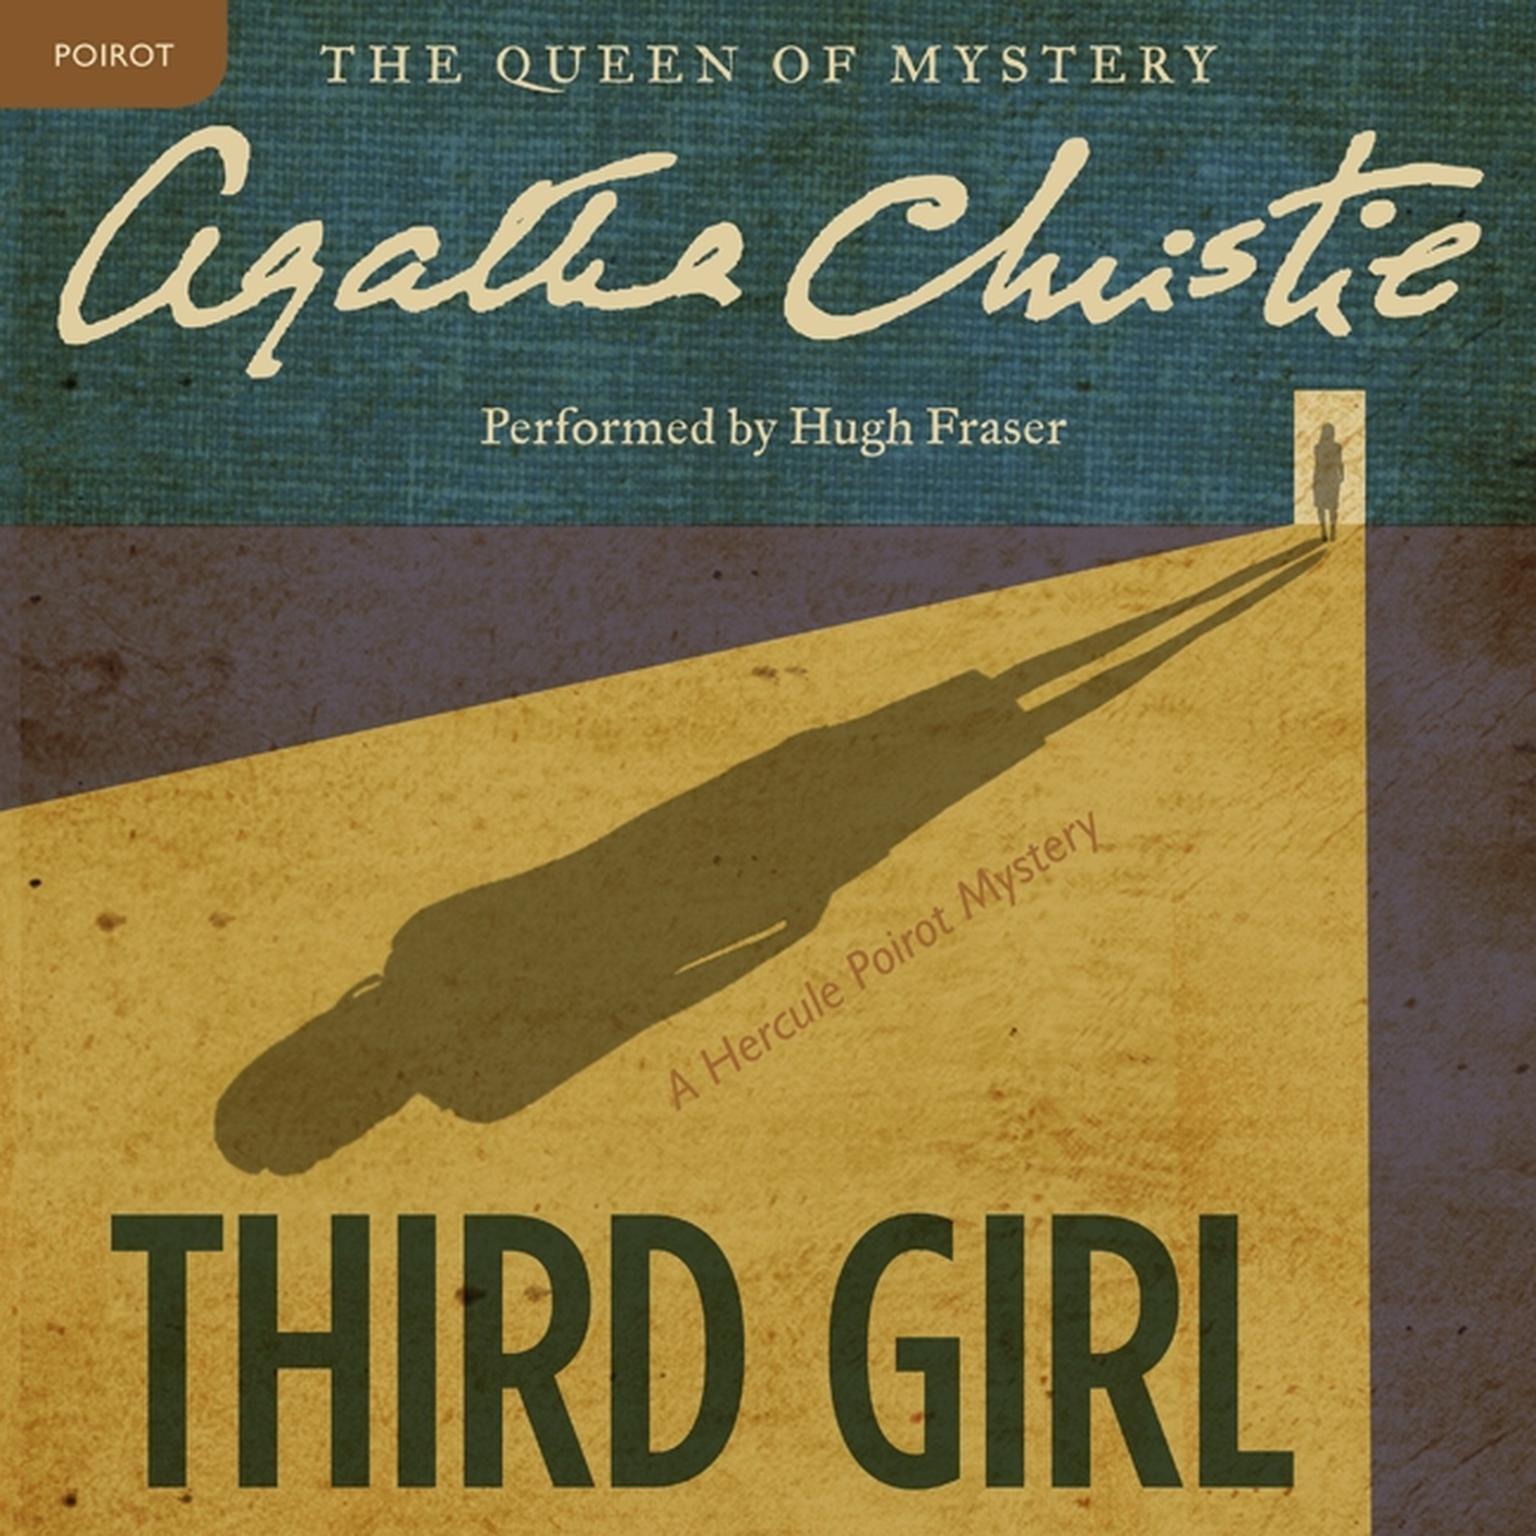 Third Girl: A Hercule Poirot Mystery Audiobook, by Agatha Christie